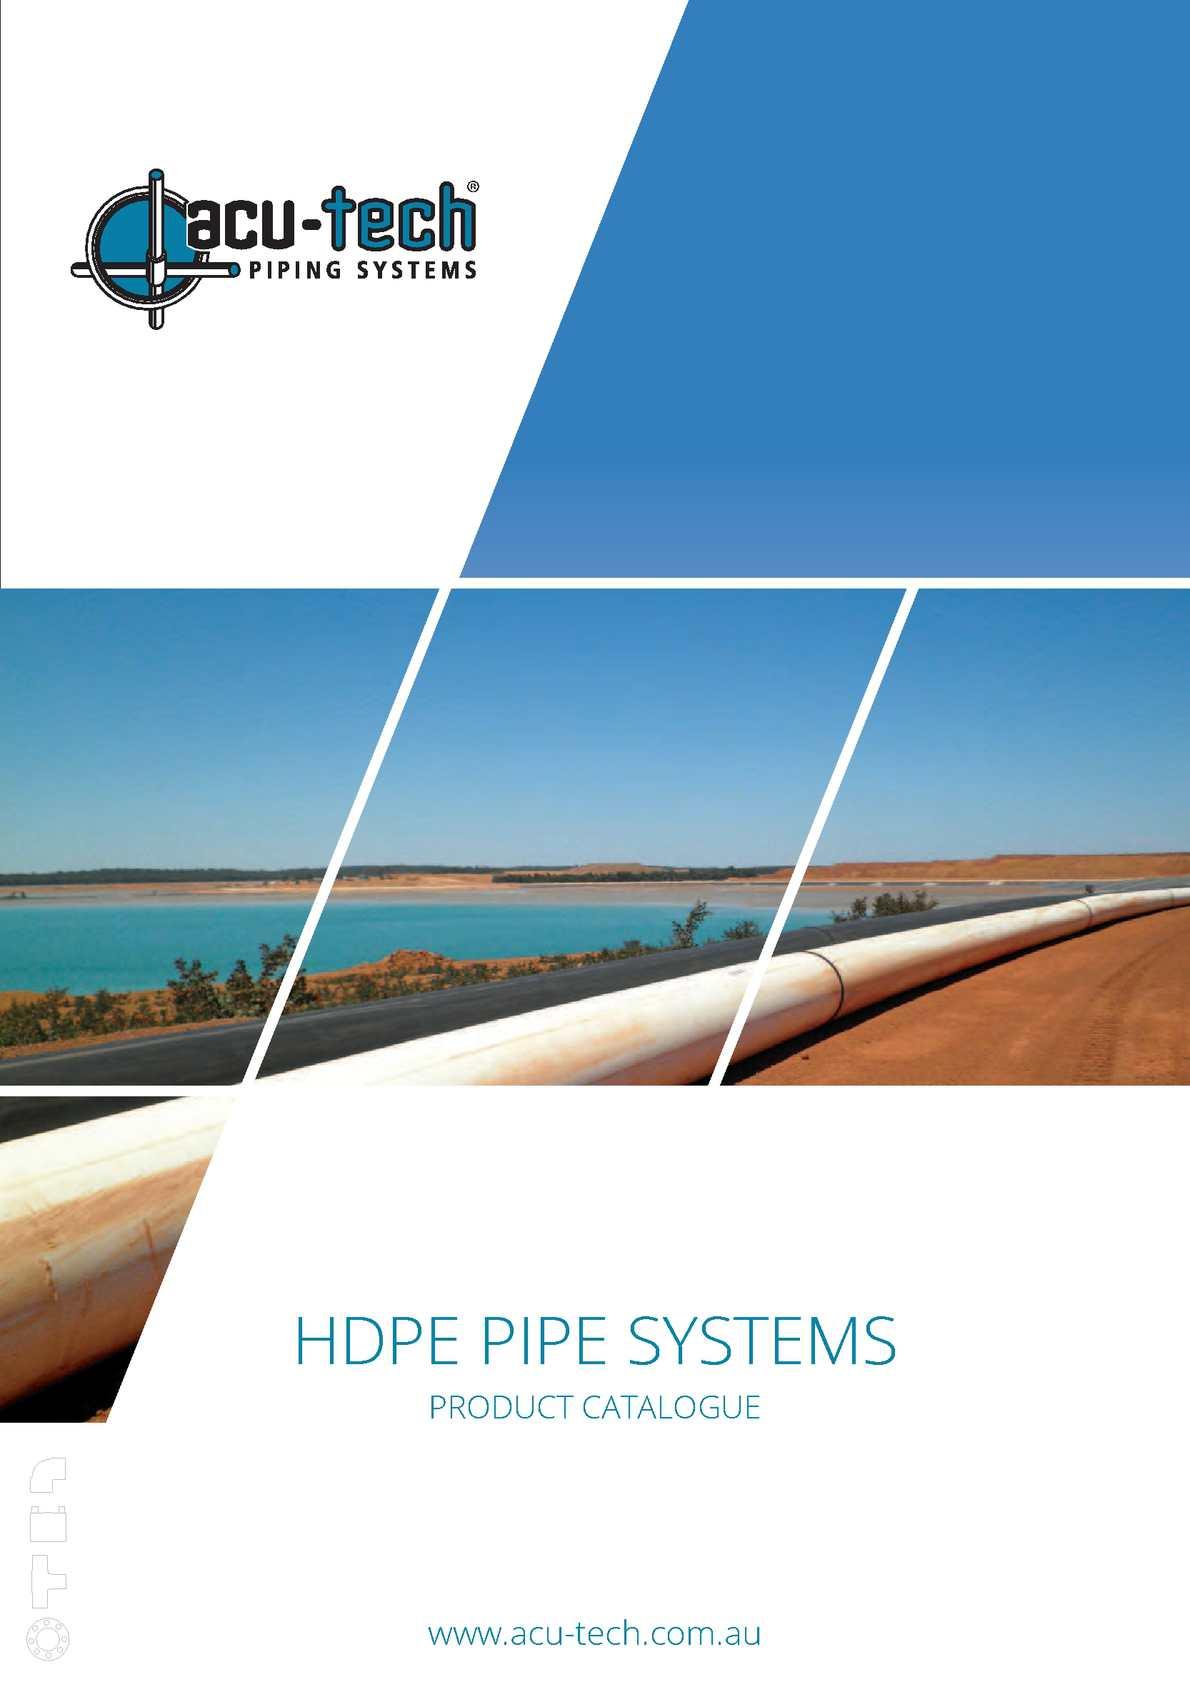 Calaméo - Acu-Tech HDPE Pipe Systems